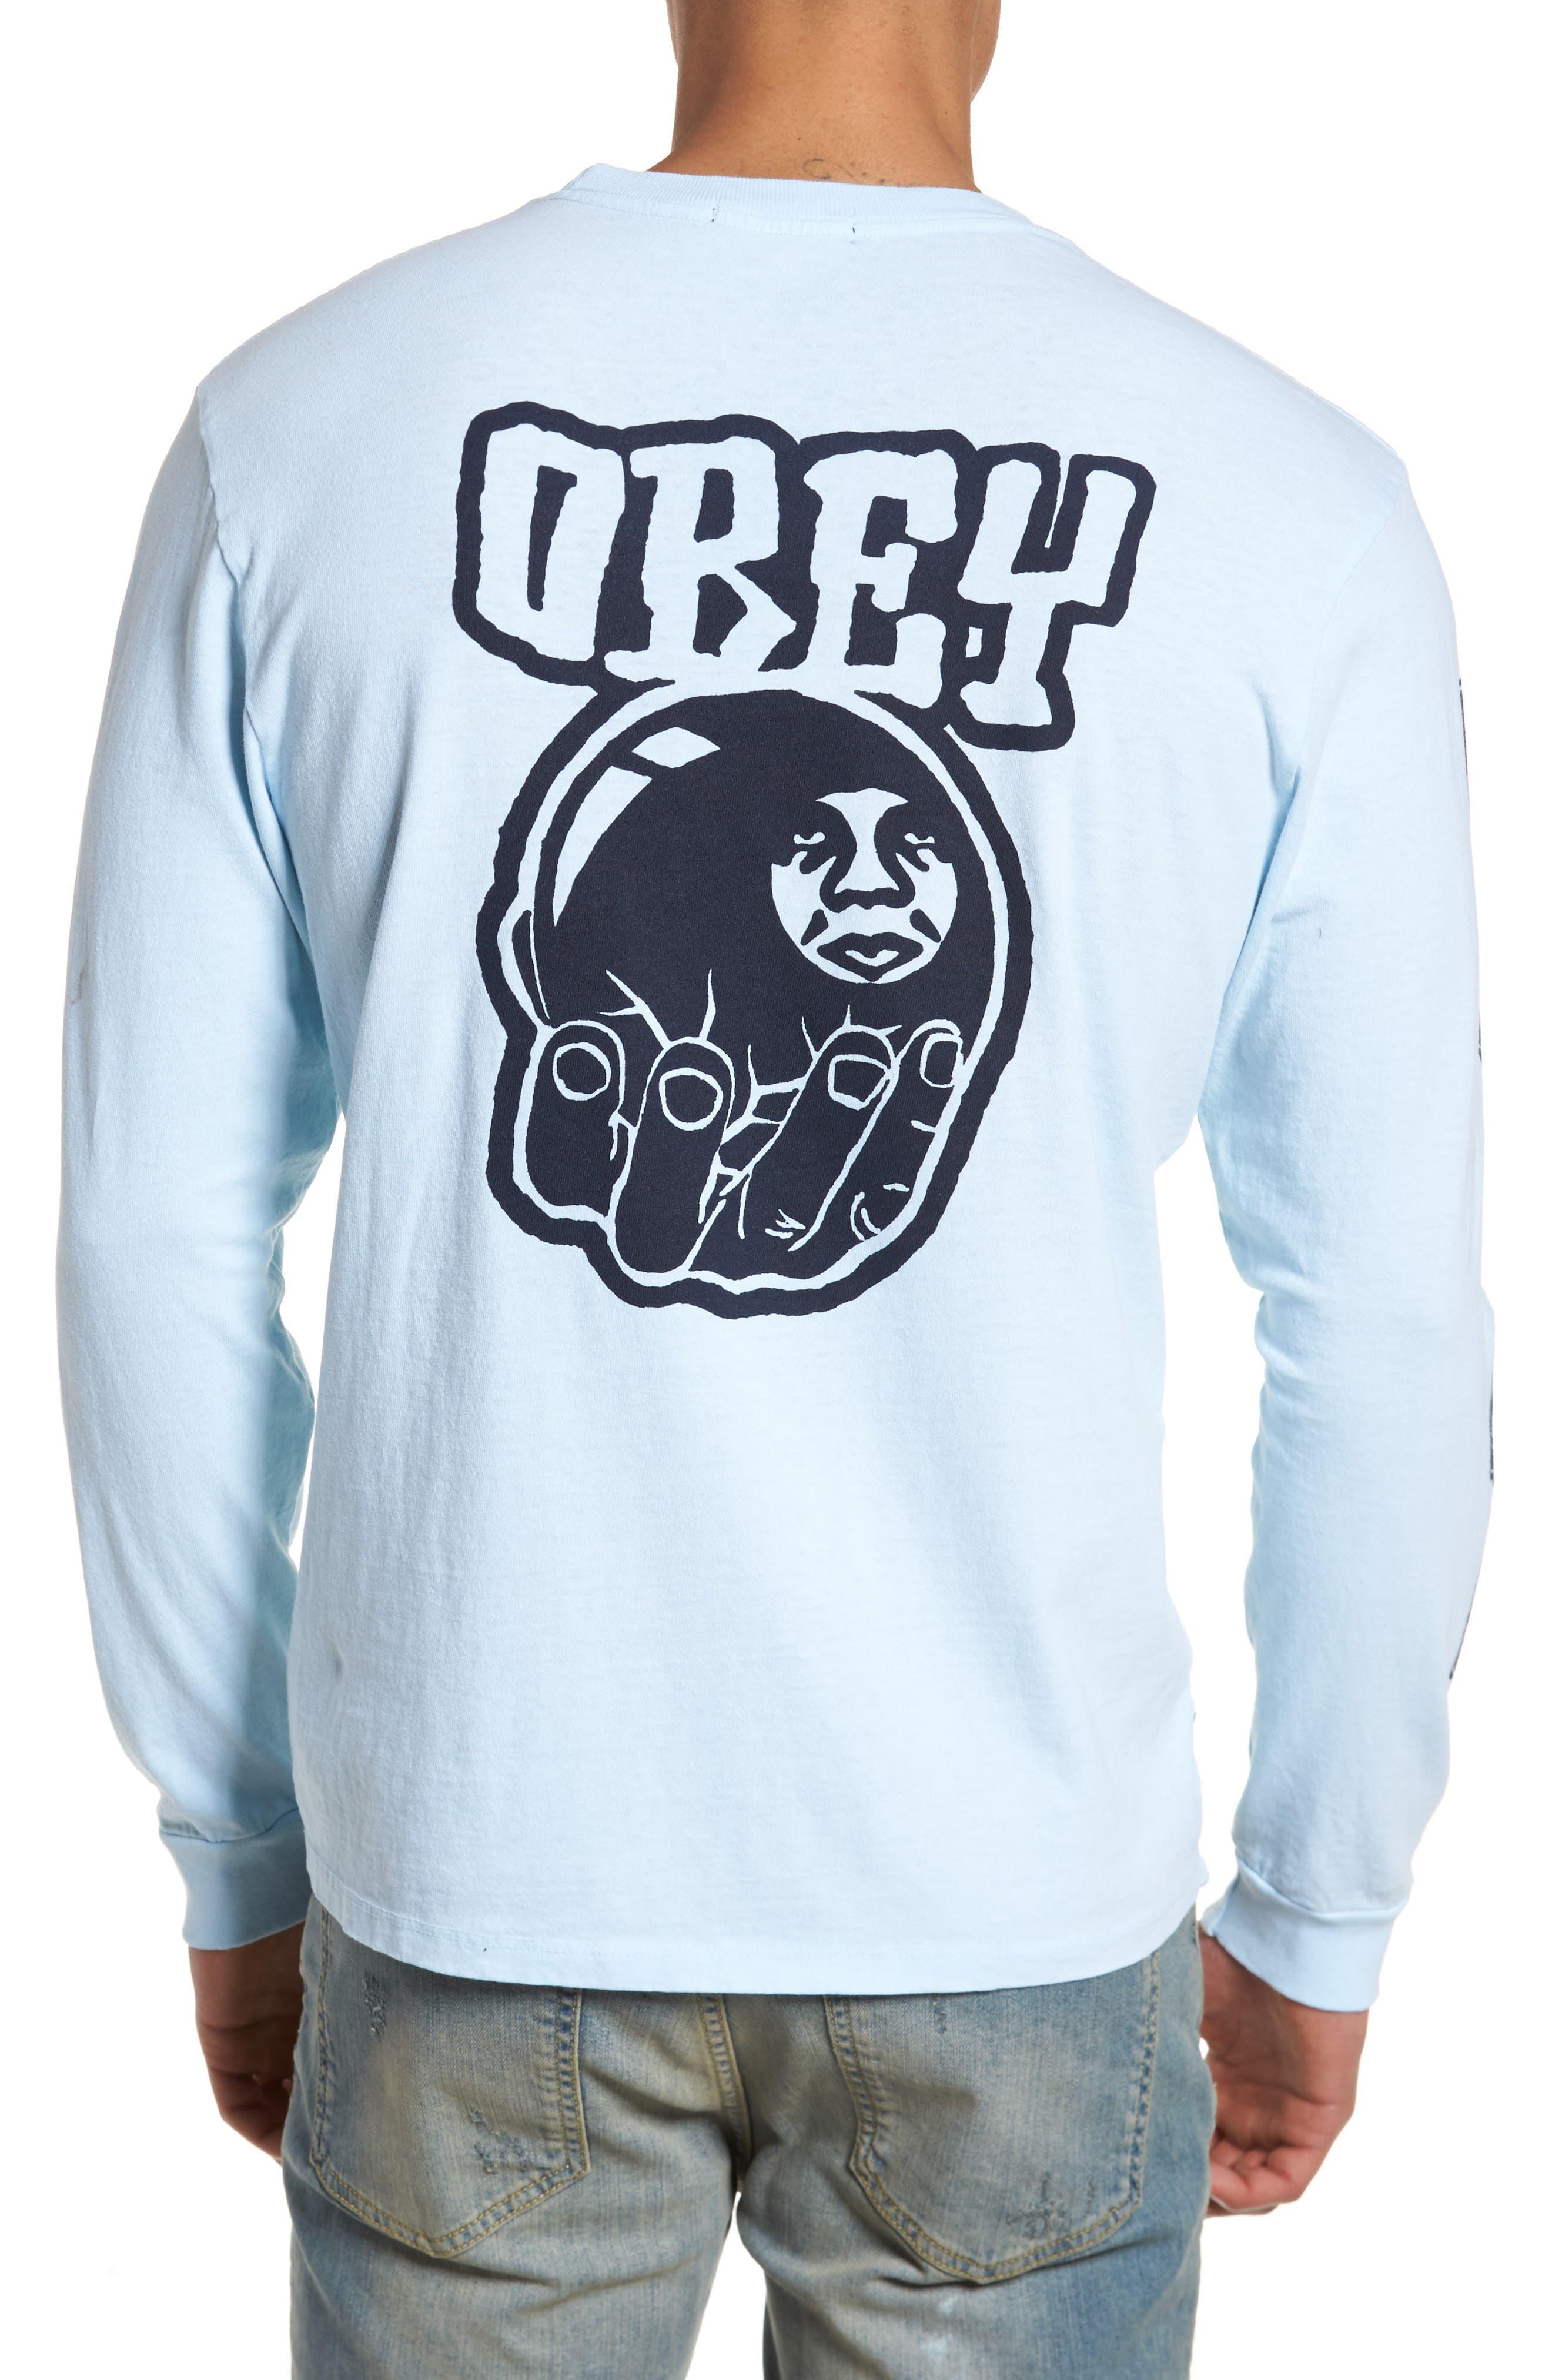 Unwritten Future Graphic T-Shirt,                             Alternate thumbnail 2, color,                             Dusty Blue